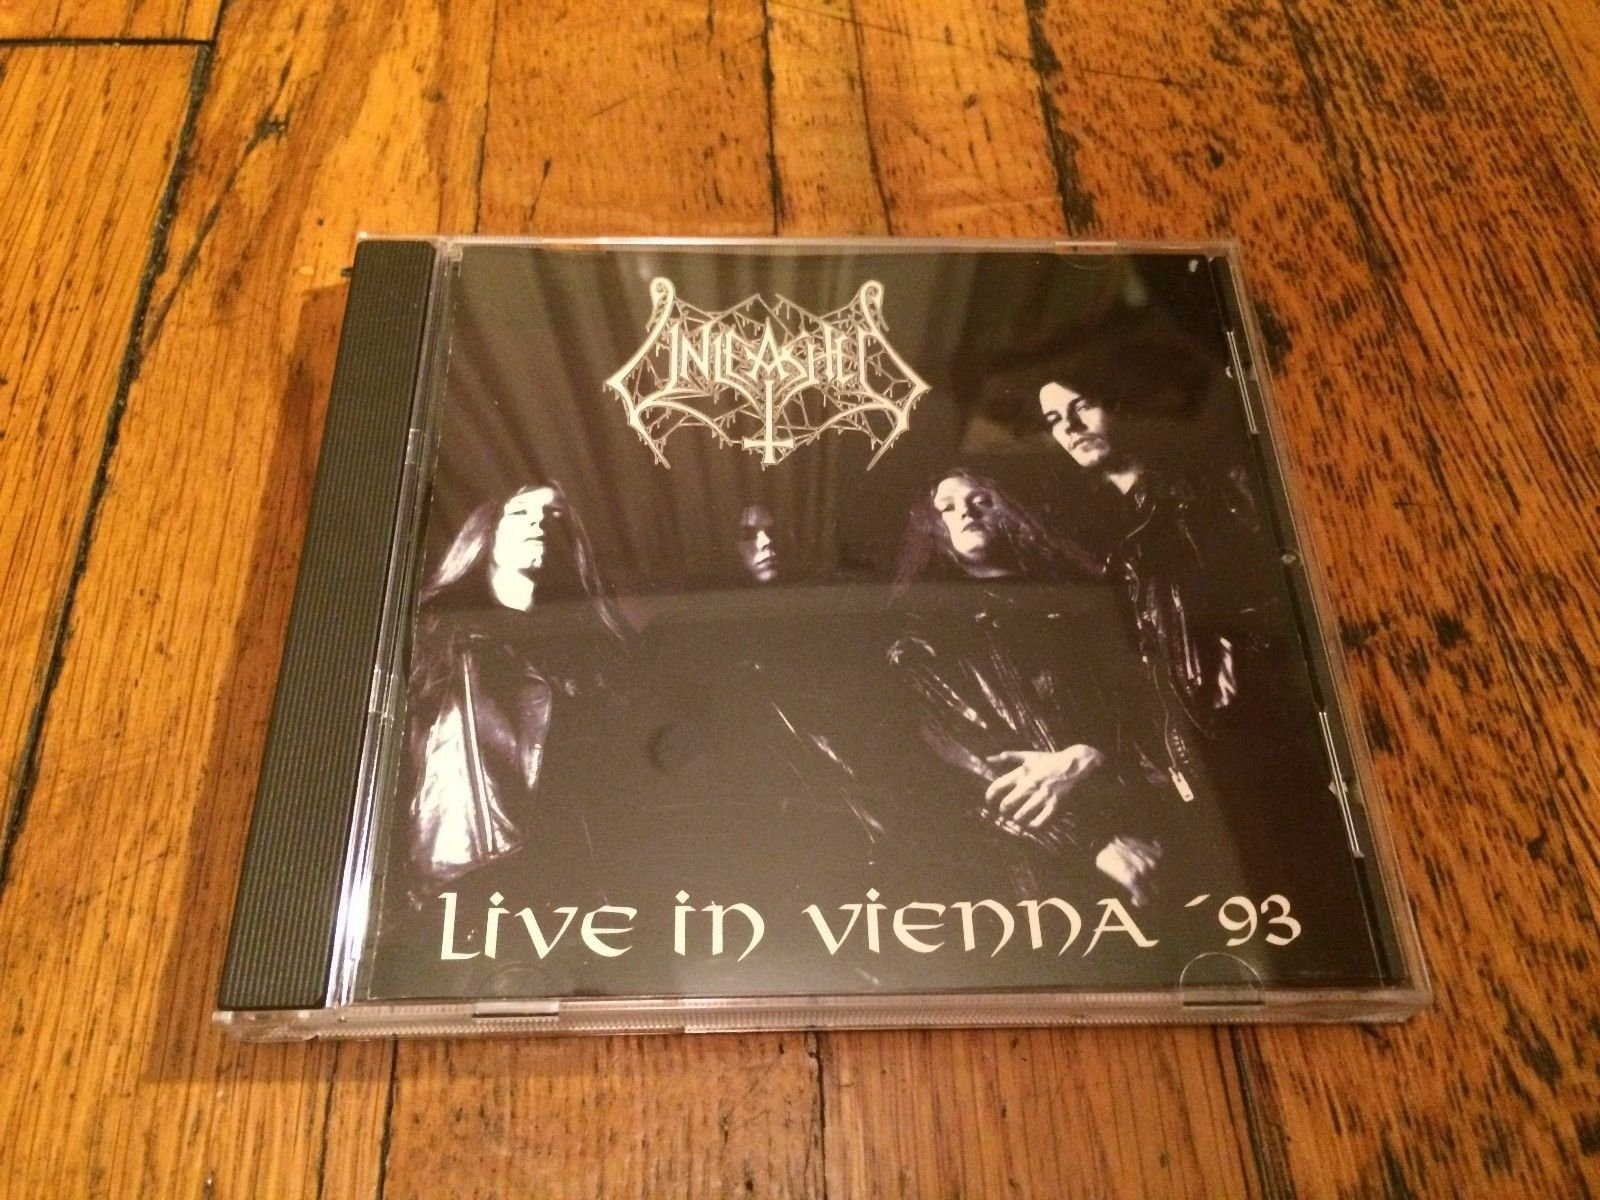 Live in Vienna 93 by Century Media